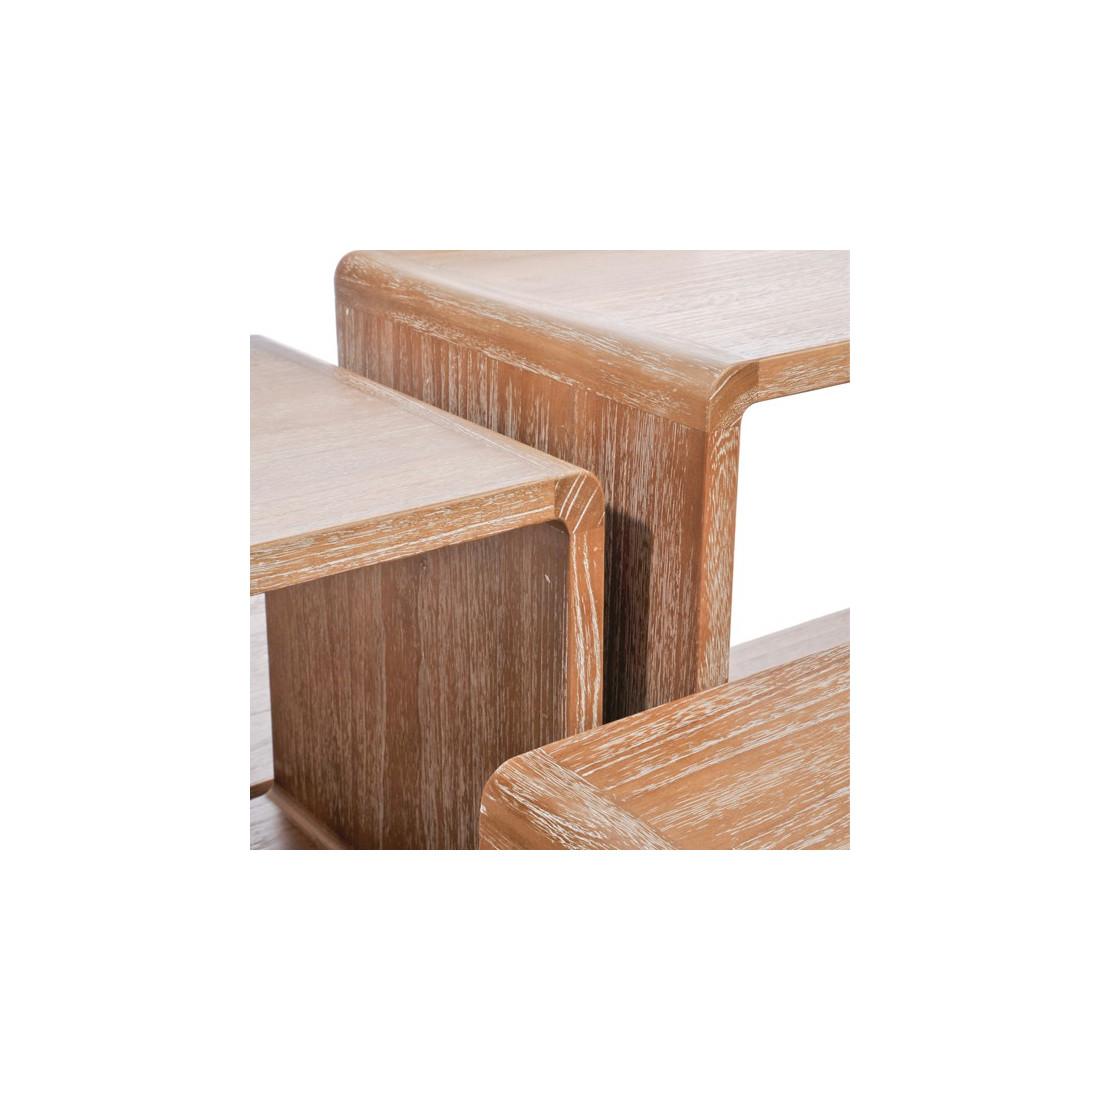 Set De 5 Tables Gigognes Bois Naturel Girolle Univers Petits